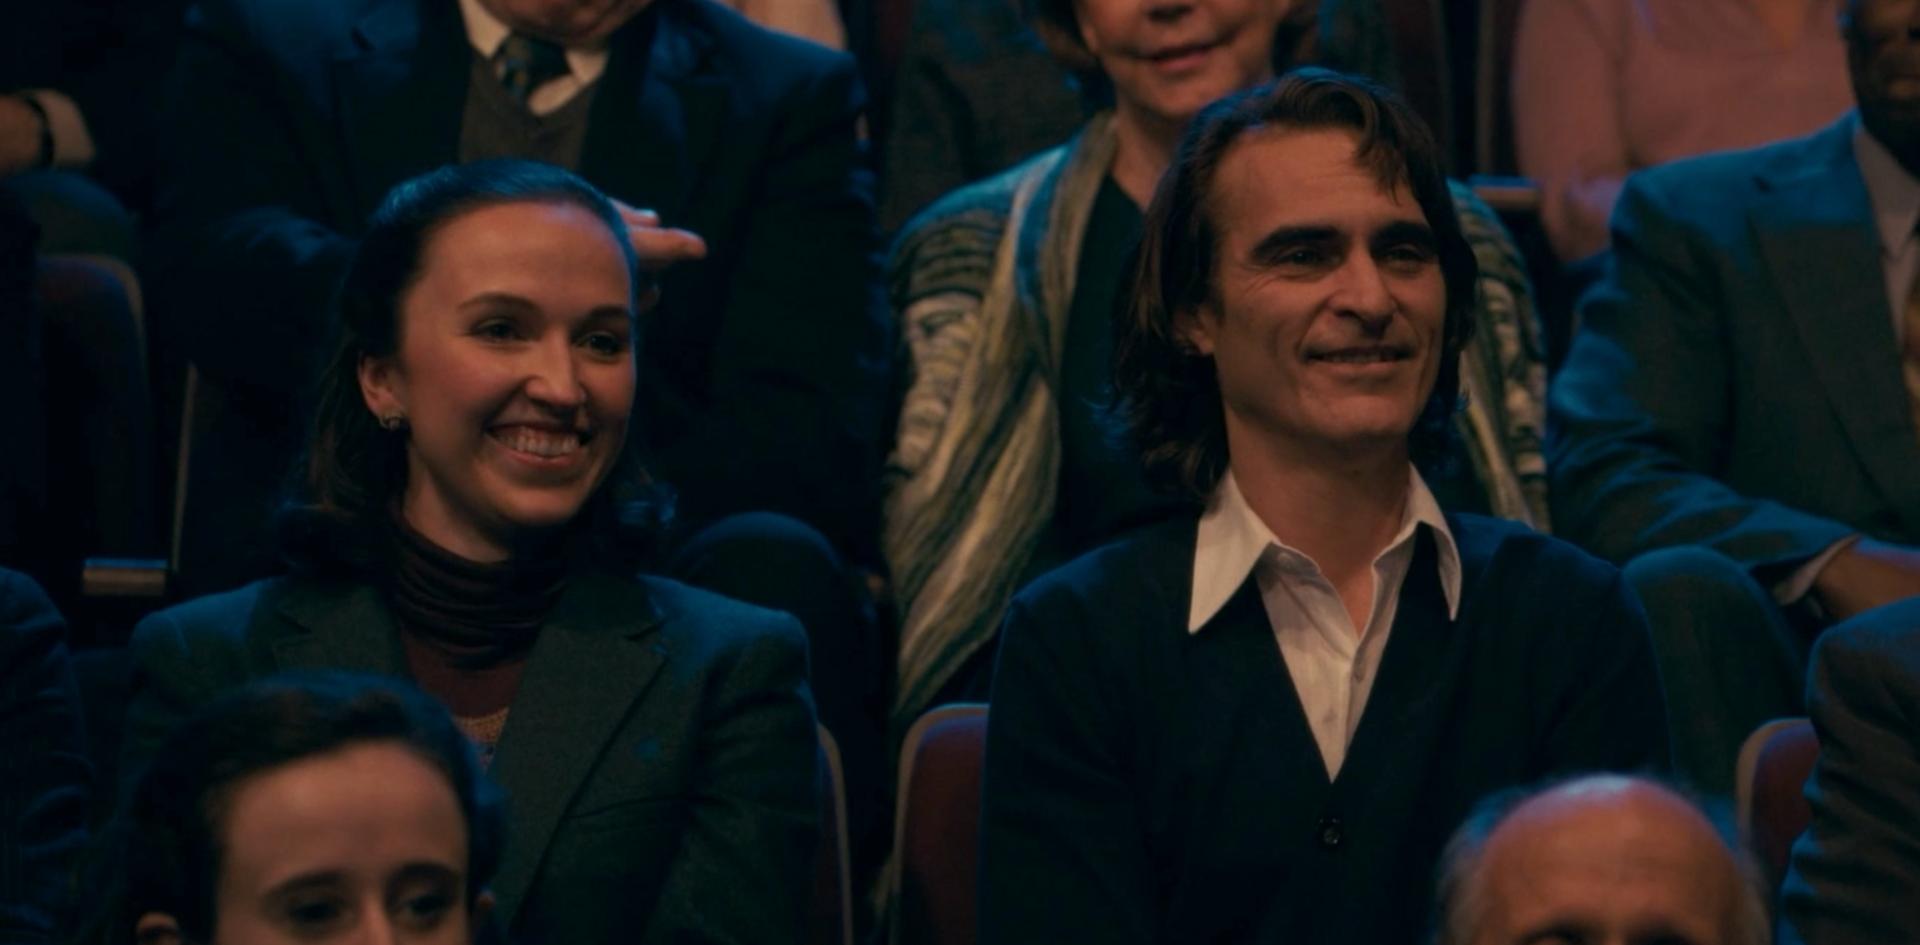 Joker feature pictured with Joaquin Phoenix